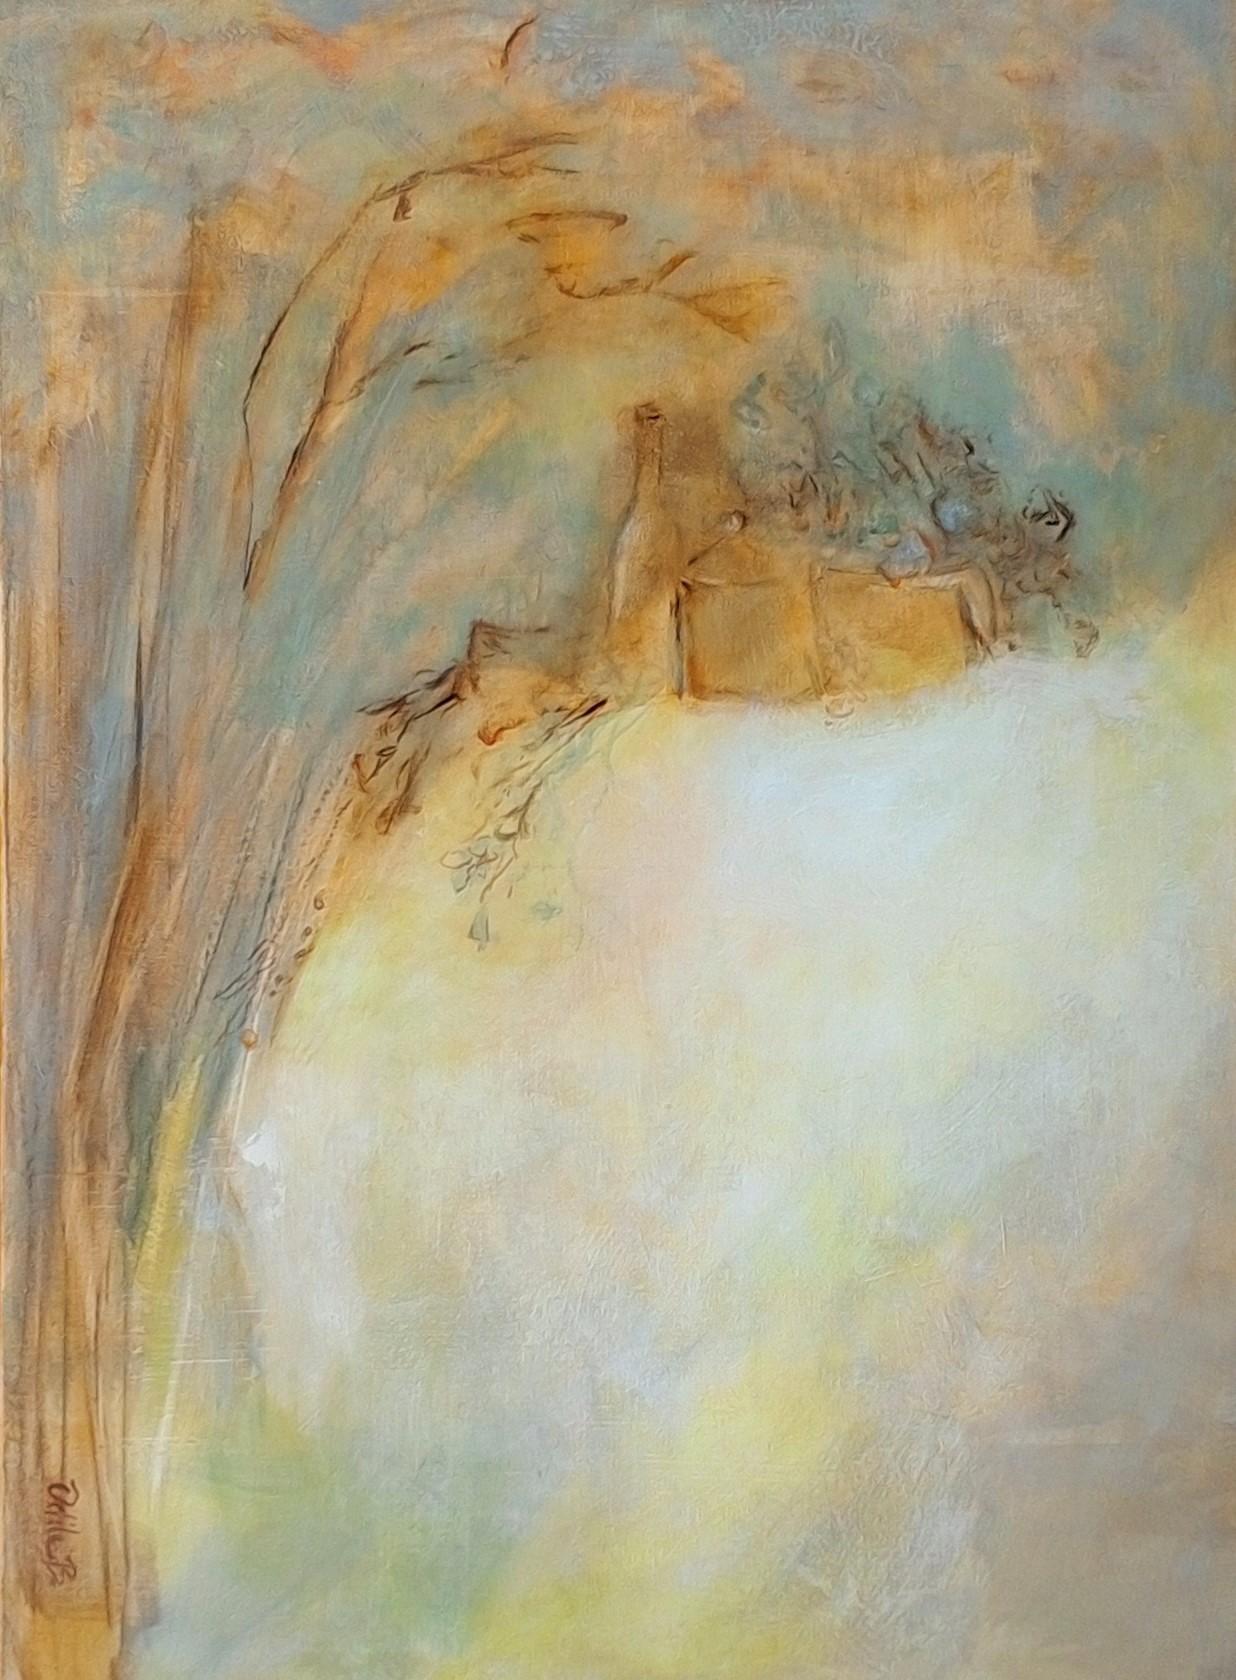 Peinture - A l'aube